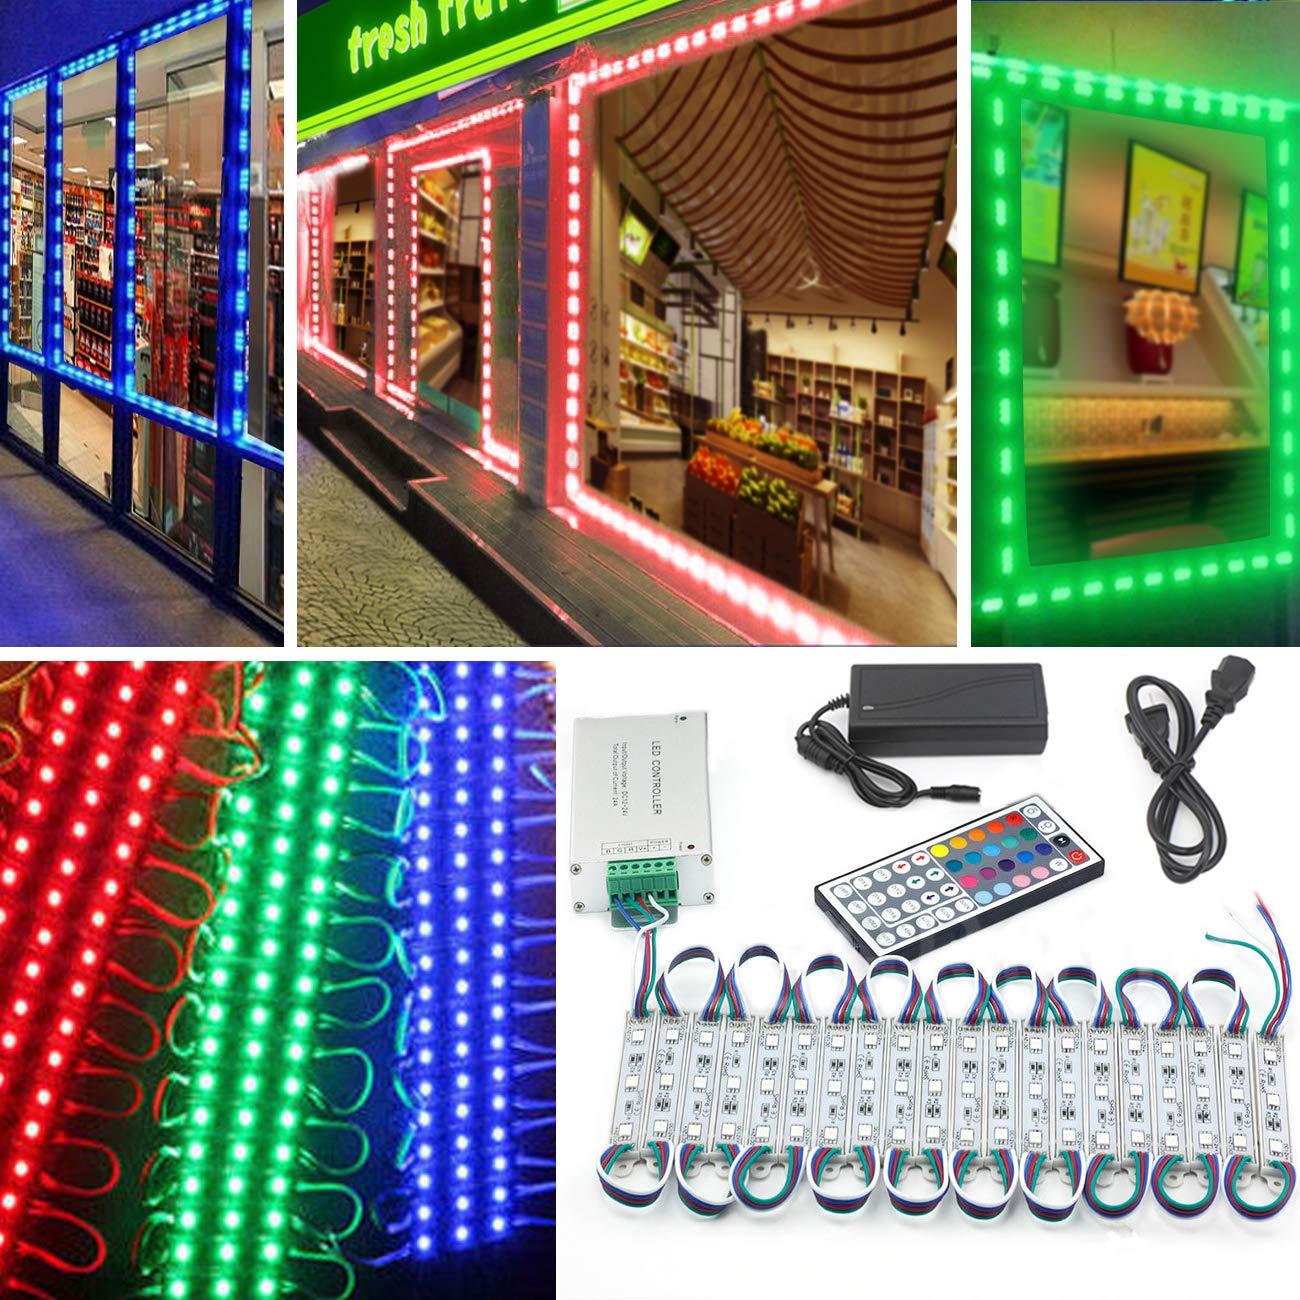 Pomelotree LED Storefront Lights,10ft 20 Pieces Waterproof Decorative Light for Letter Sign Advertising Signs LED Light module,LED Module Store Front Window Sign Strip Light (RGB light)